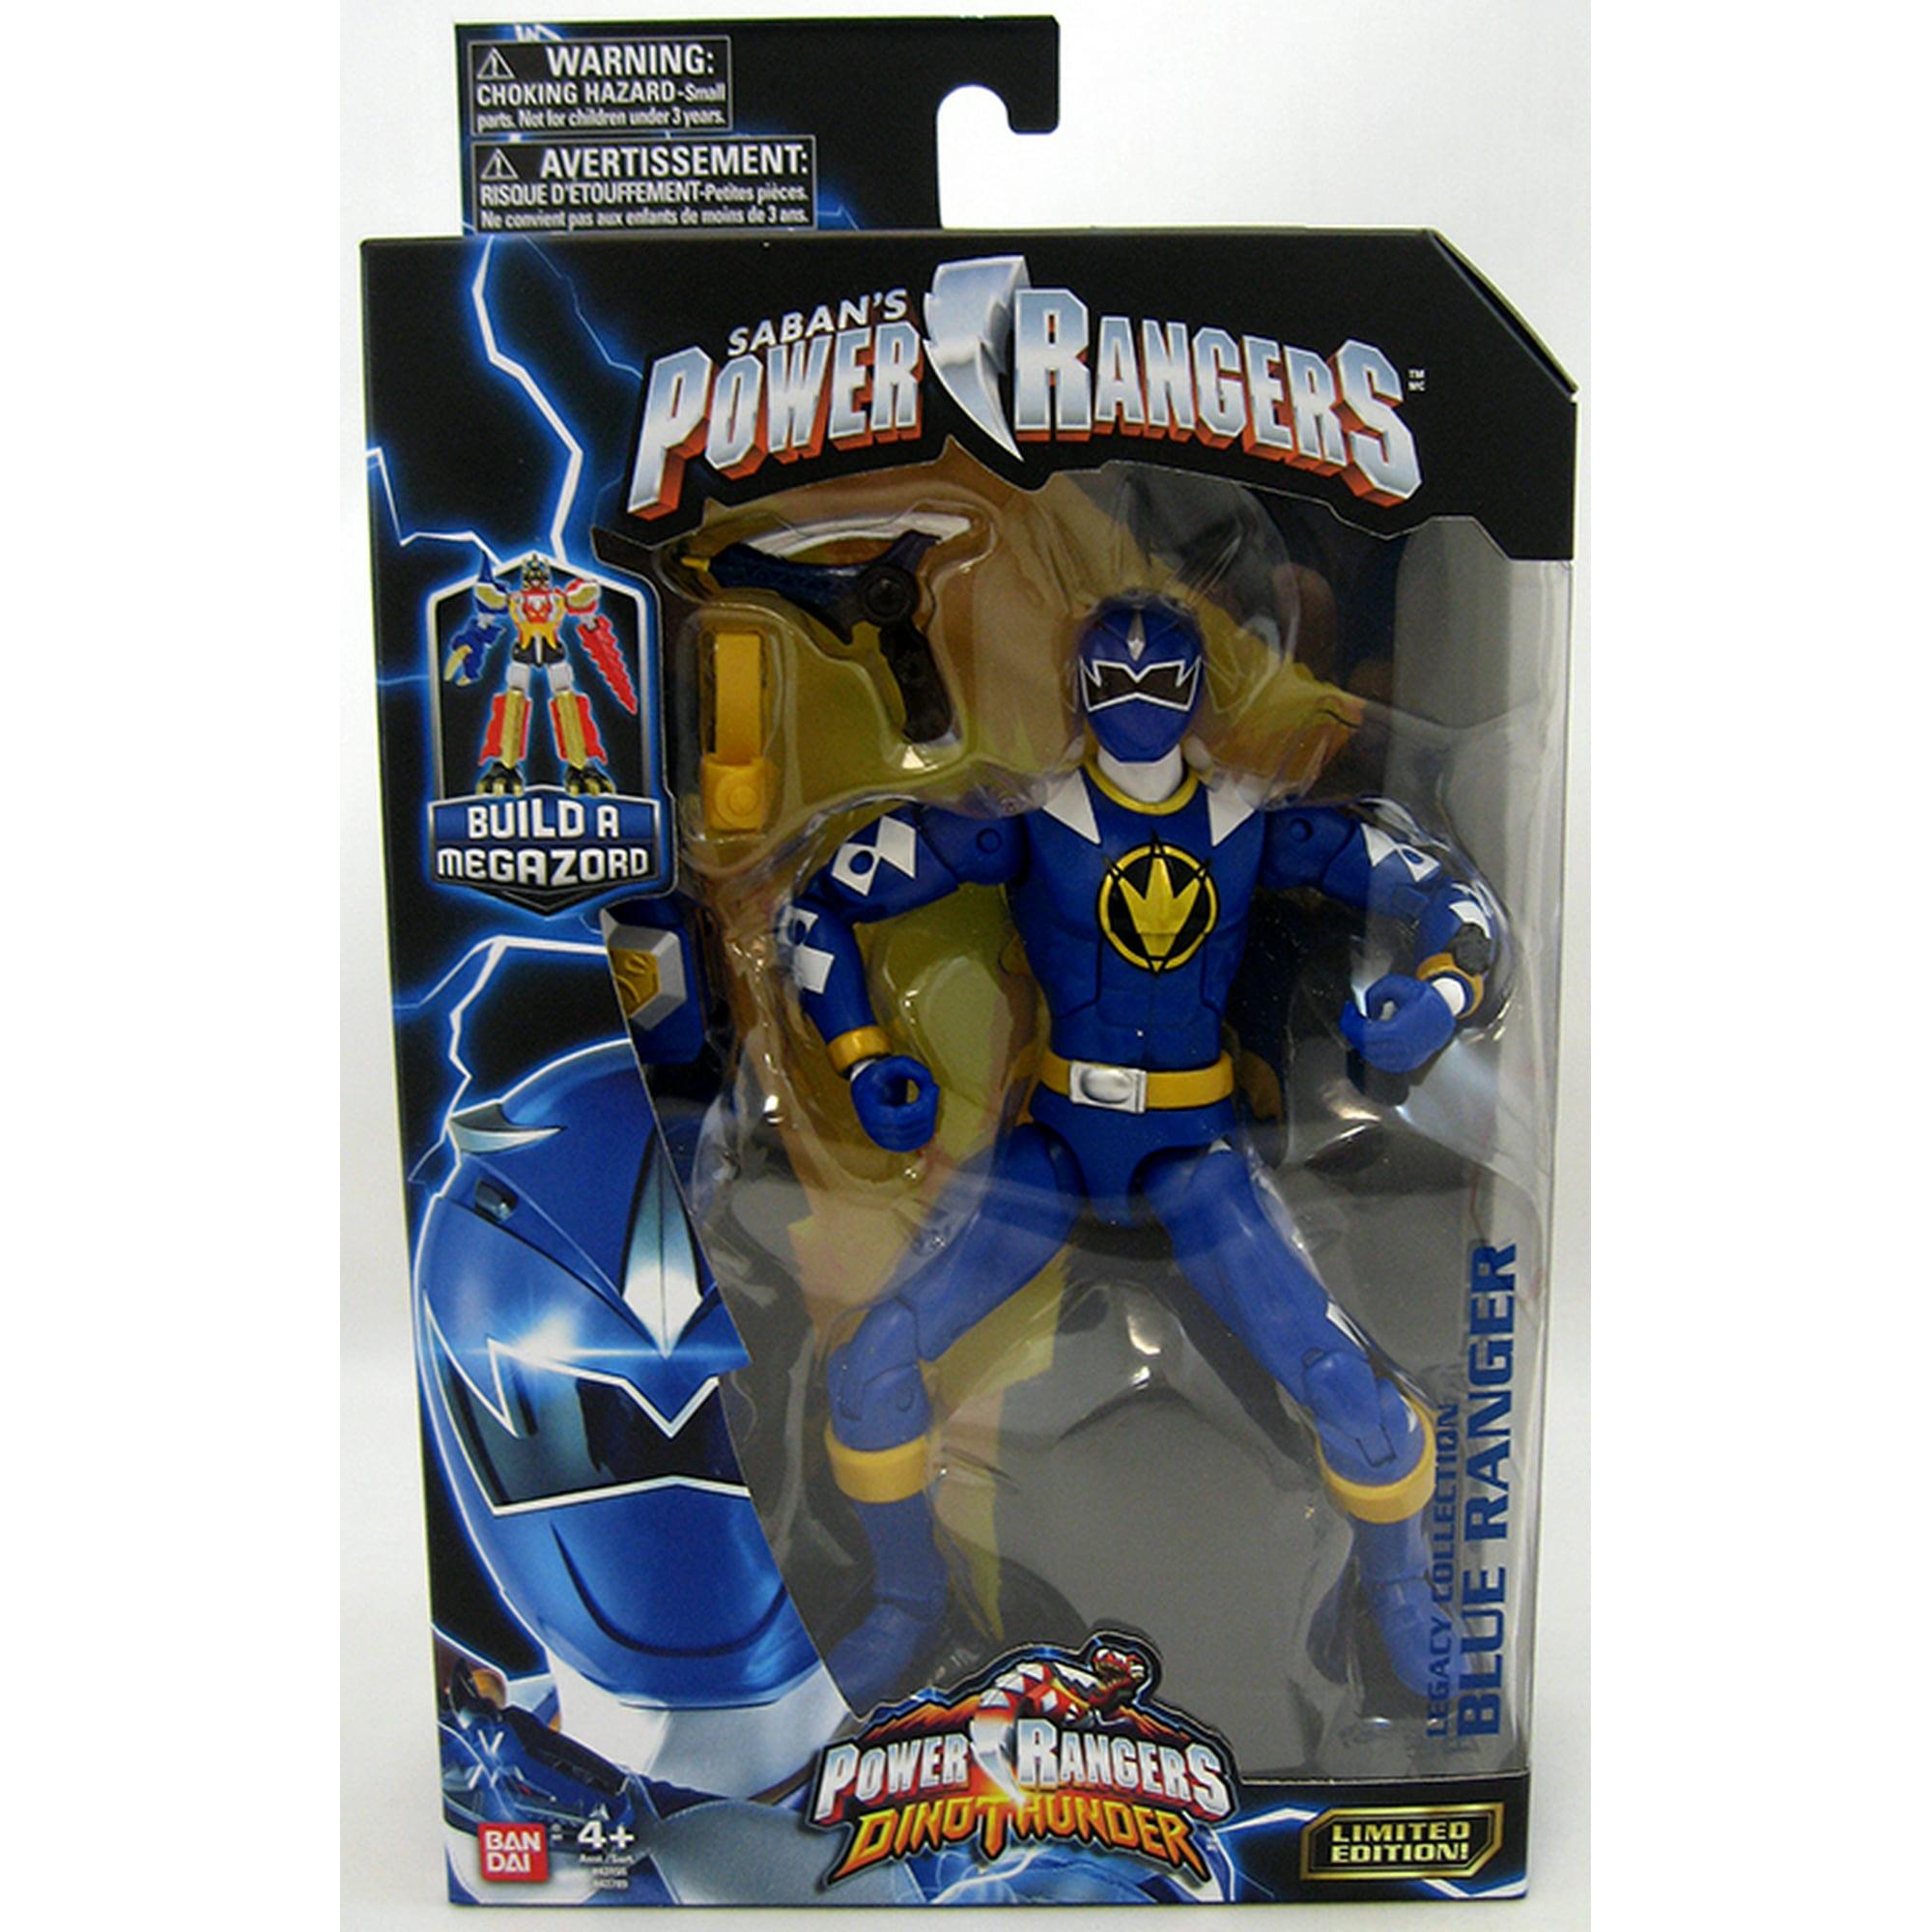 Power Rangers Legacy 6 Inch Action Figure Thundersaurus Megazord Series -  Blue Ranger Dino Thunder